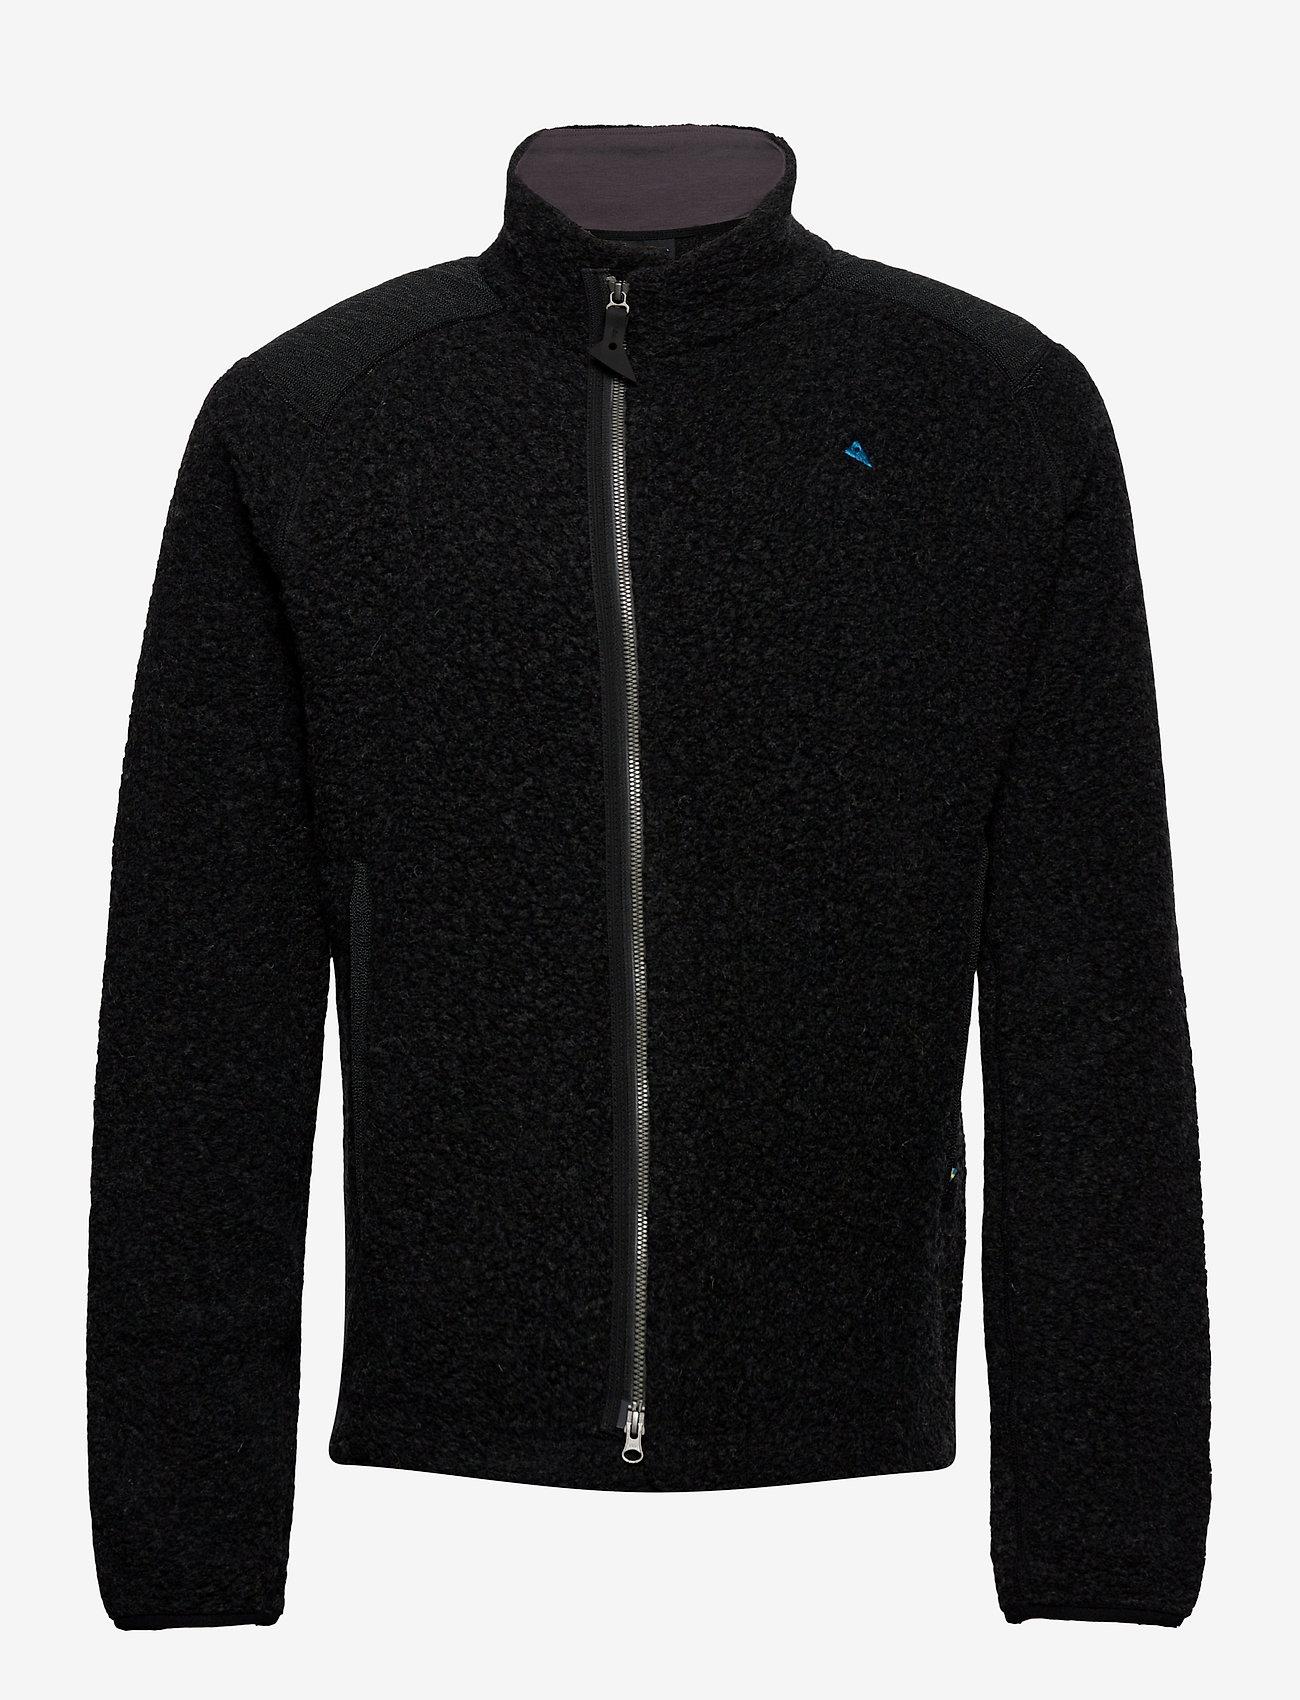 Klättermusen - Skoll Zip M's - fleece - charcoal - 1